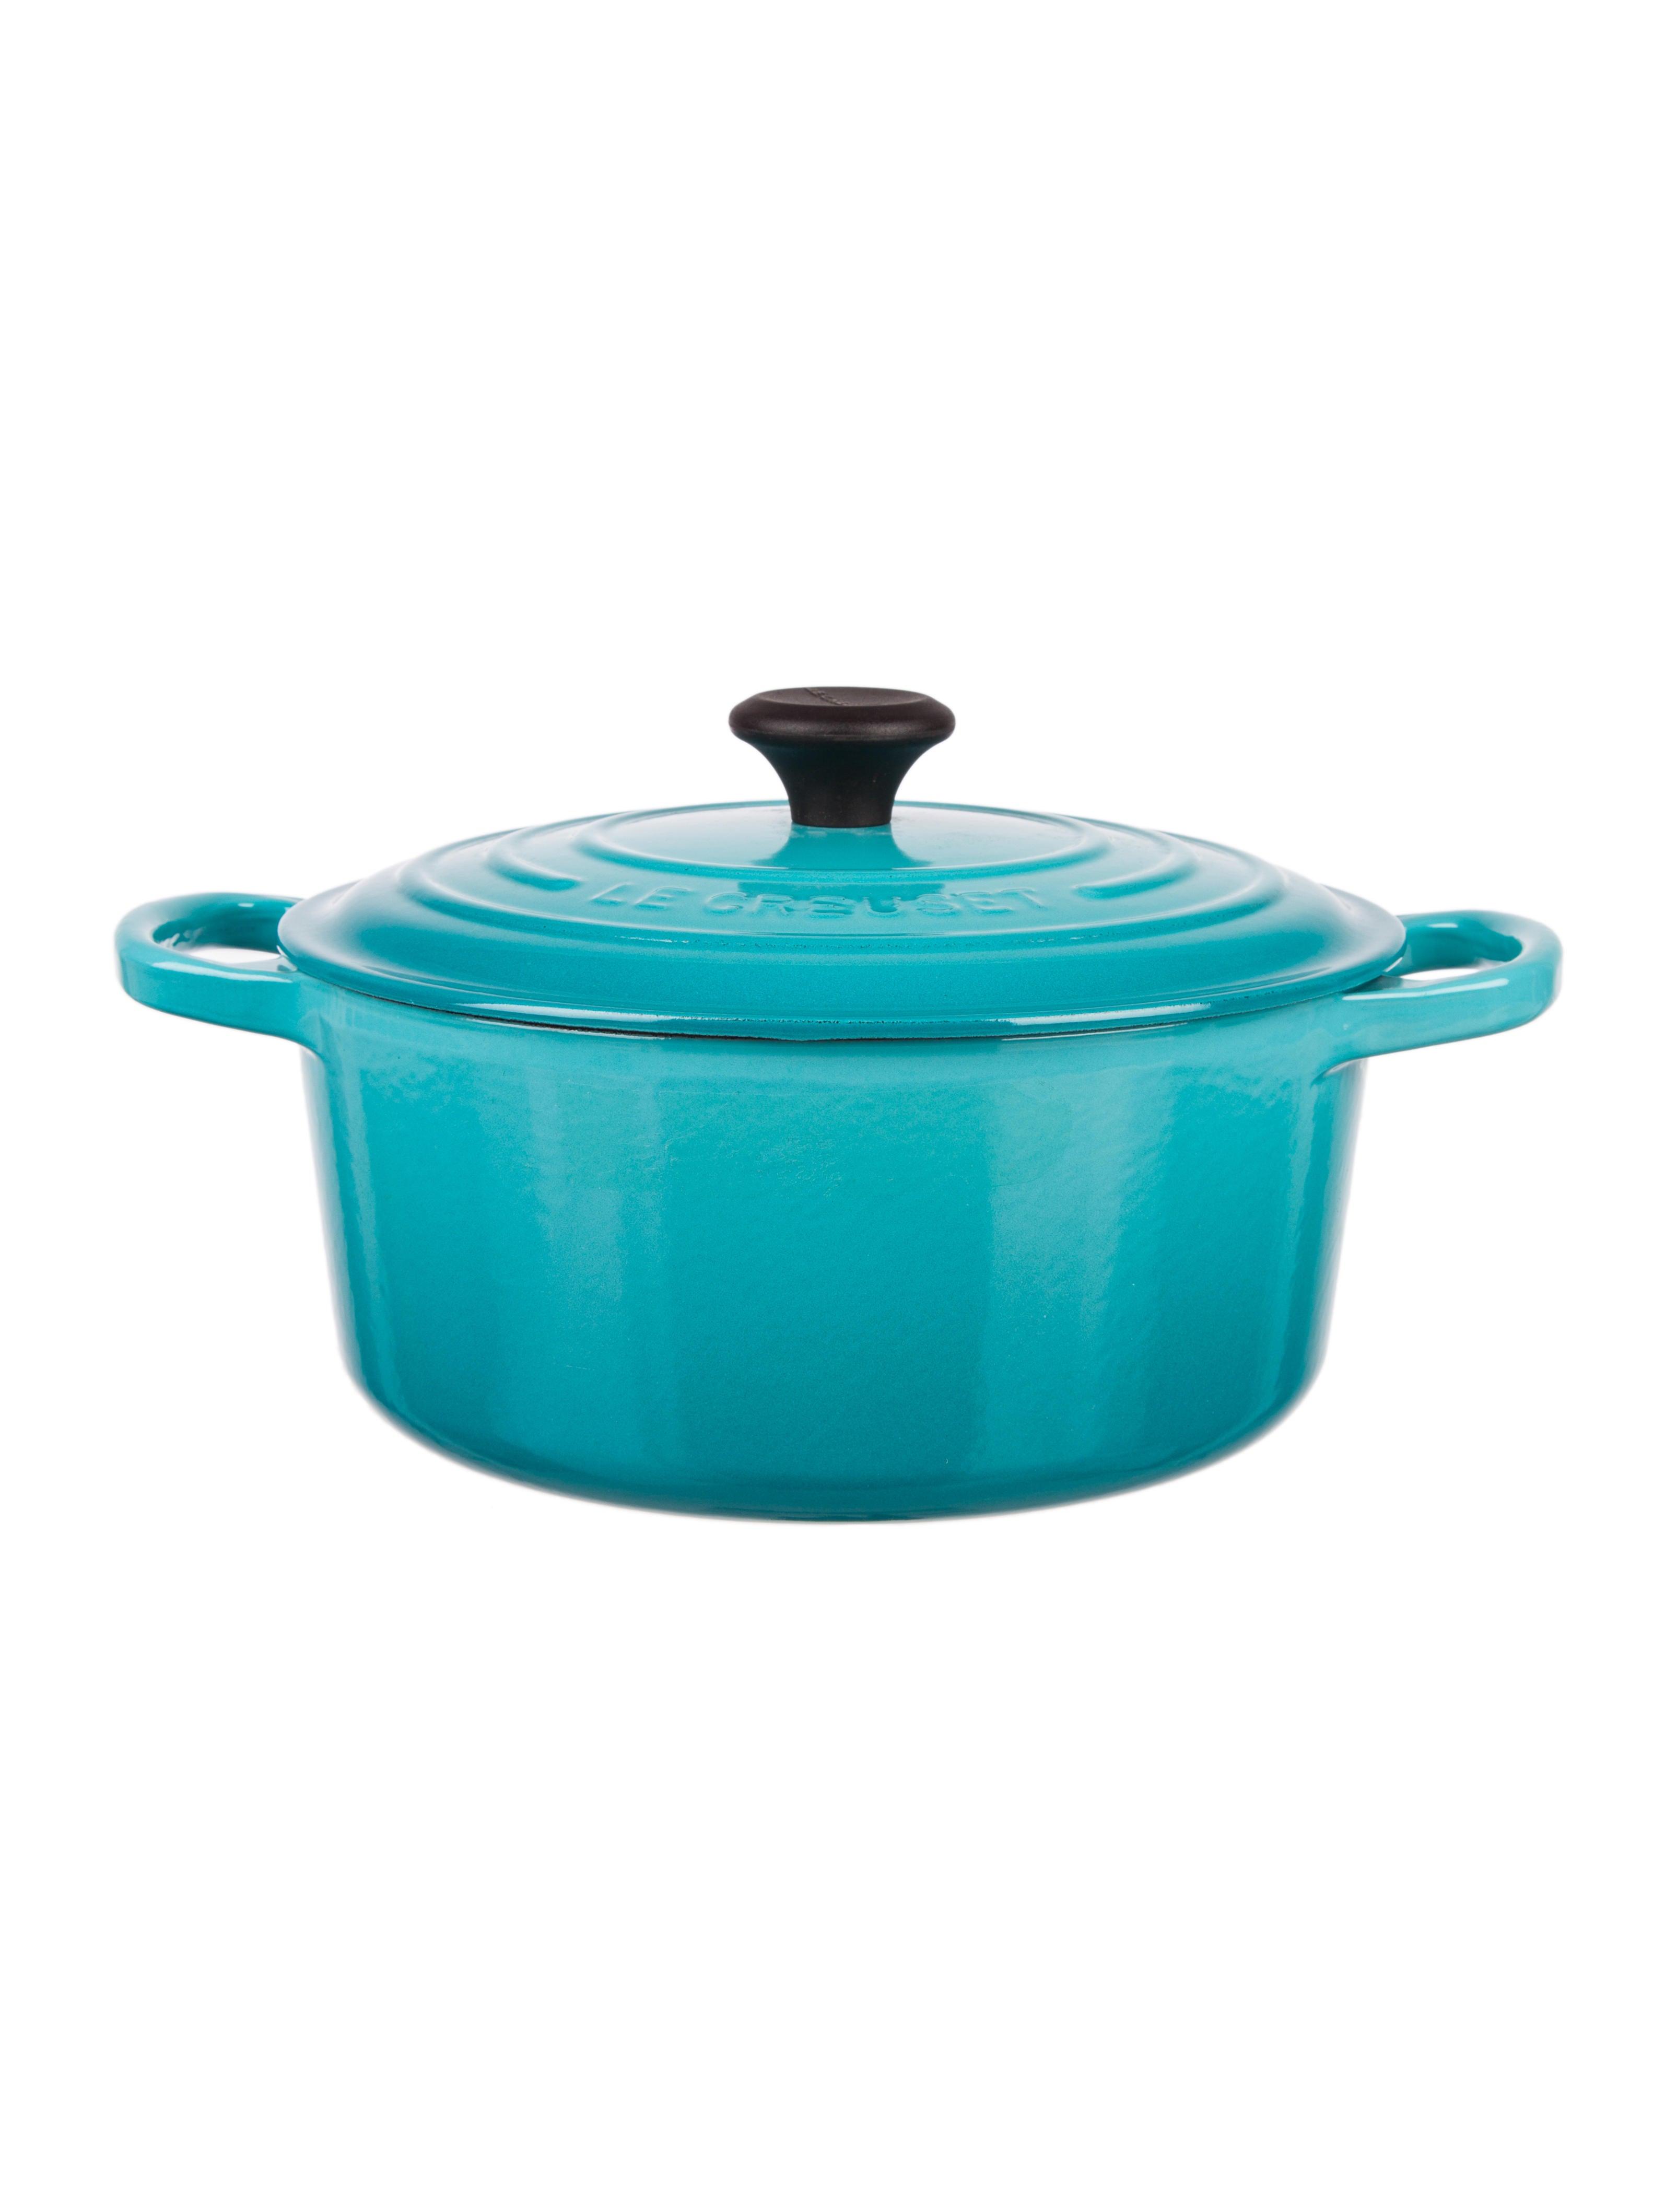 Le Creuset 4-Piece Cast Iron Cookware Set - Tabletop And Kitchen ...